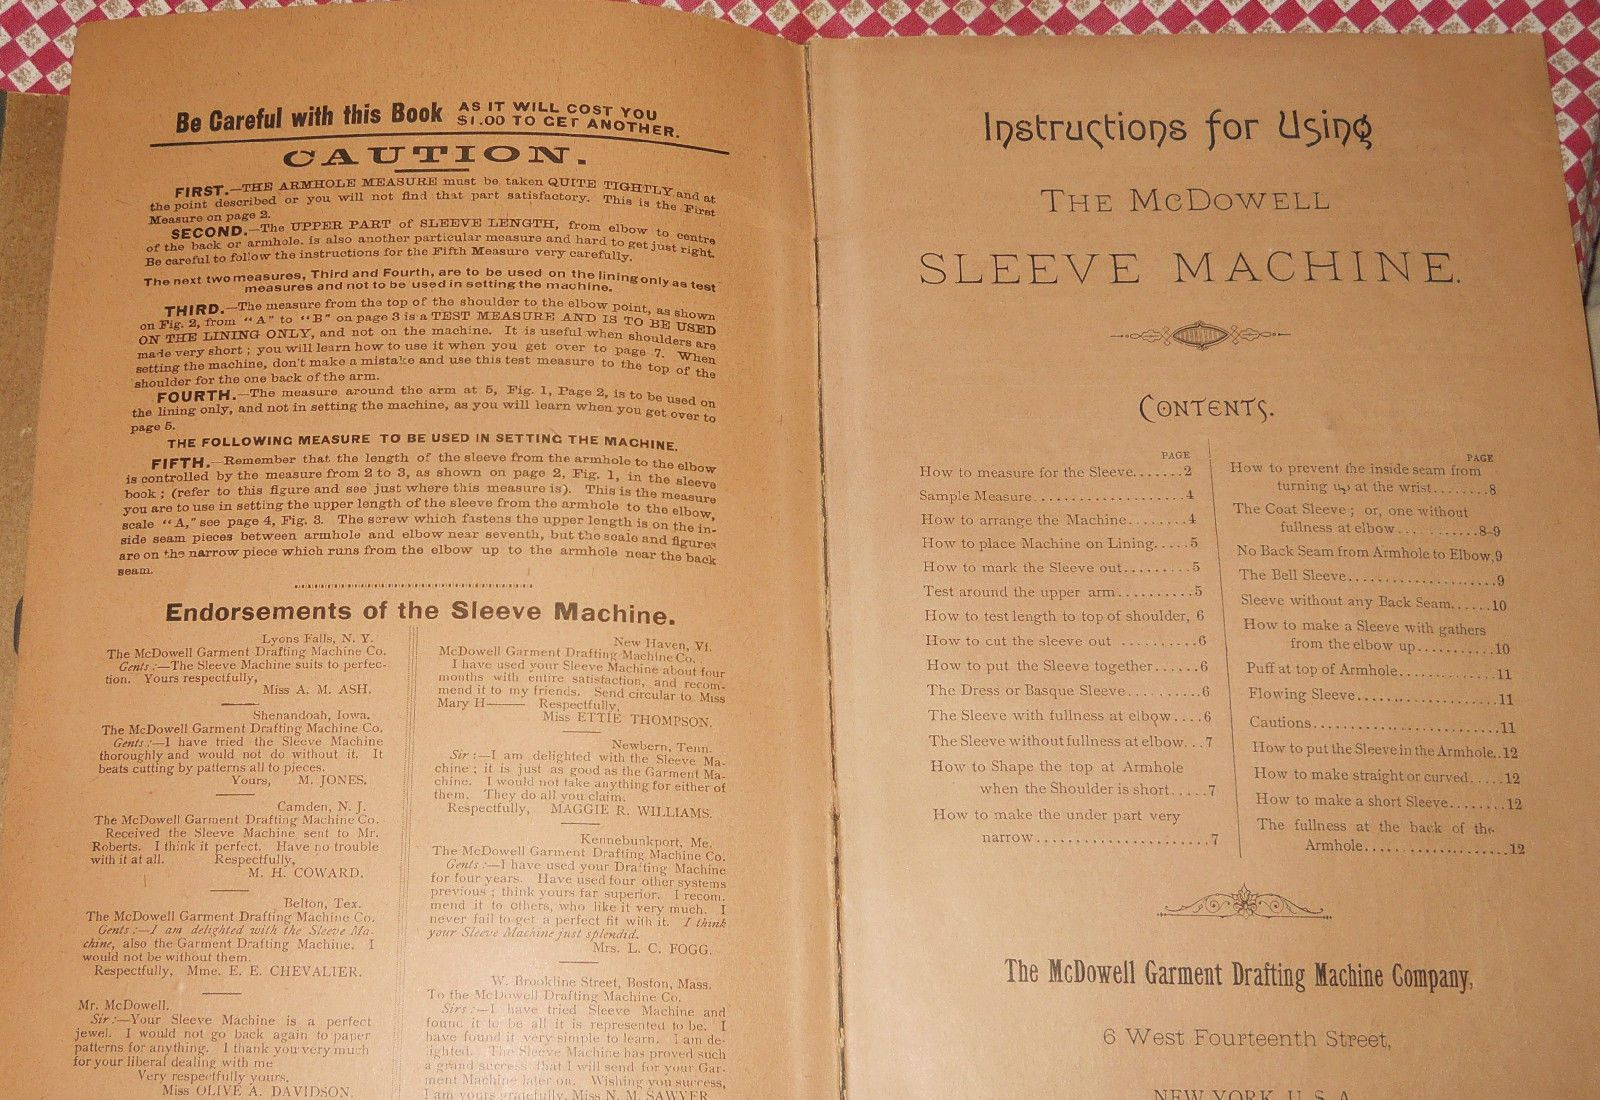 http://www.ebay.com/itm/McDowell-Garment-Drafting-Machine-Instruction-Book-1891-complete-/361381940049?ssPageName=STRK:MEBIDX:IT